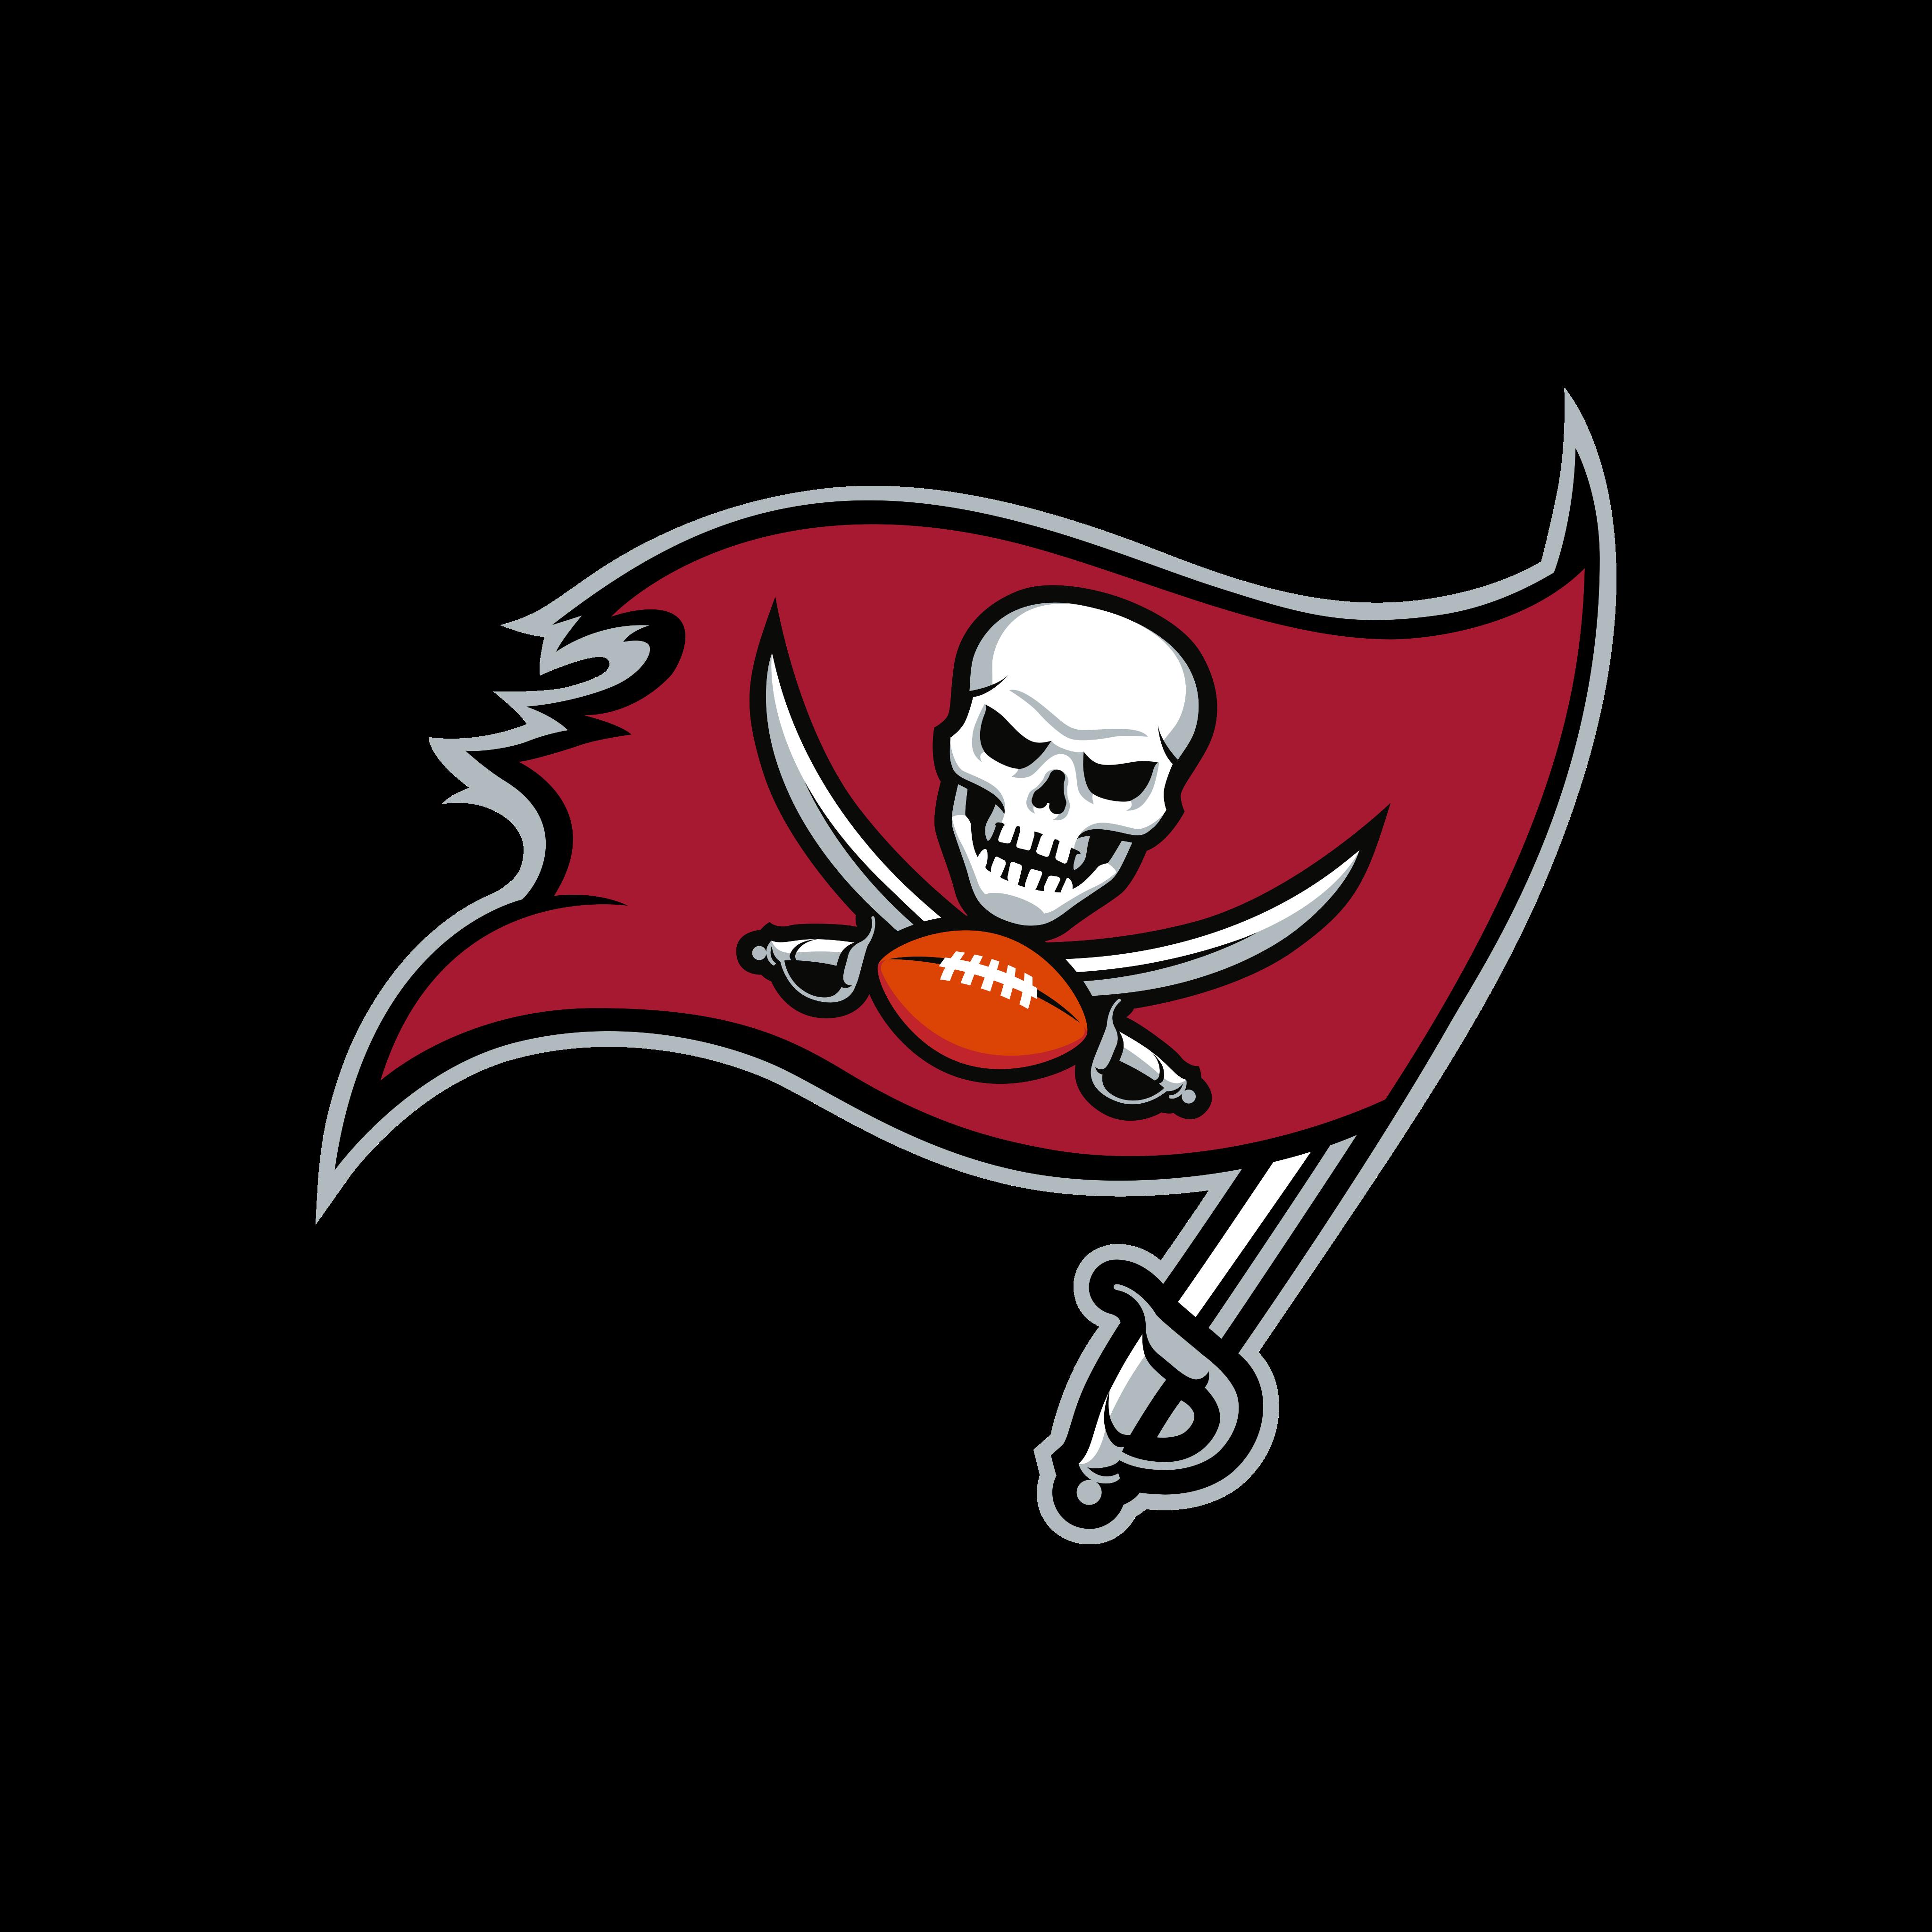 tampa bay buccaneers logo 0 - Tampa Bay Buccaneers Logo